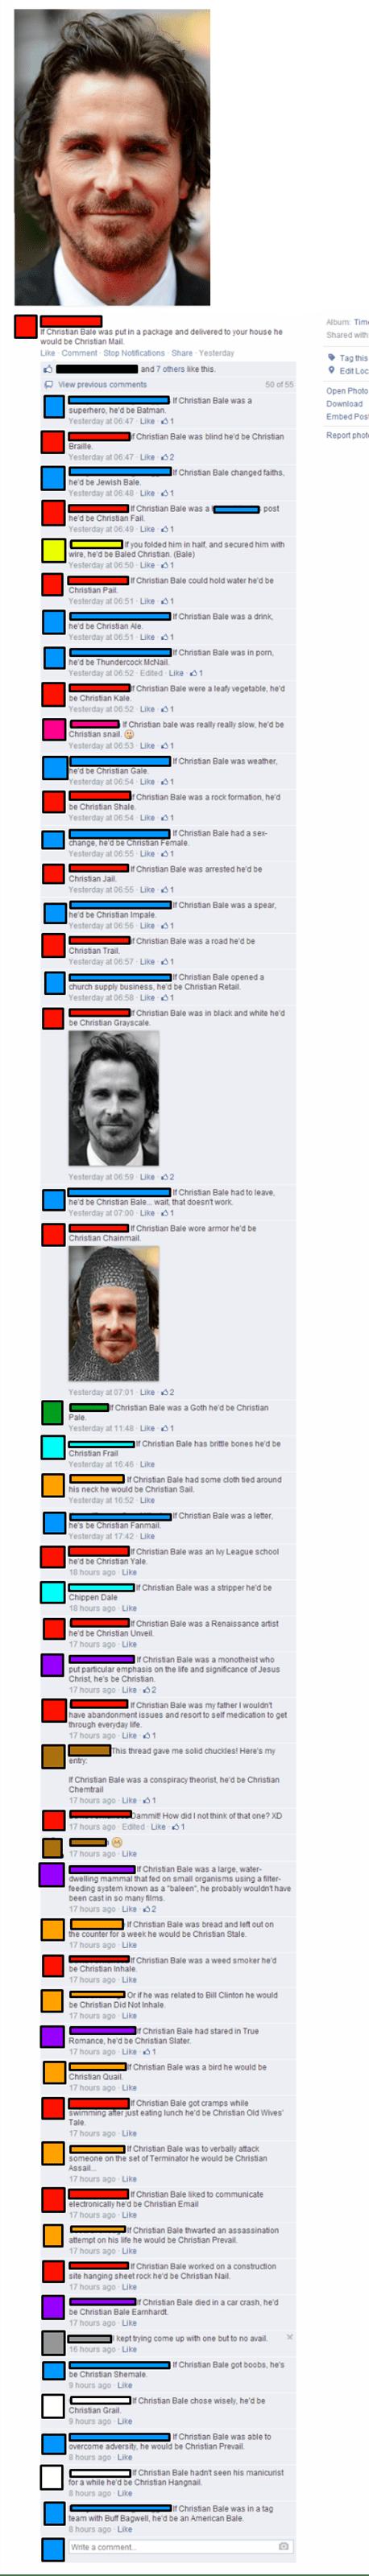 christian bale facebook comments